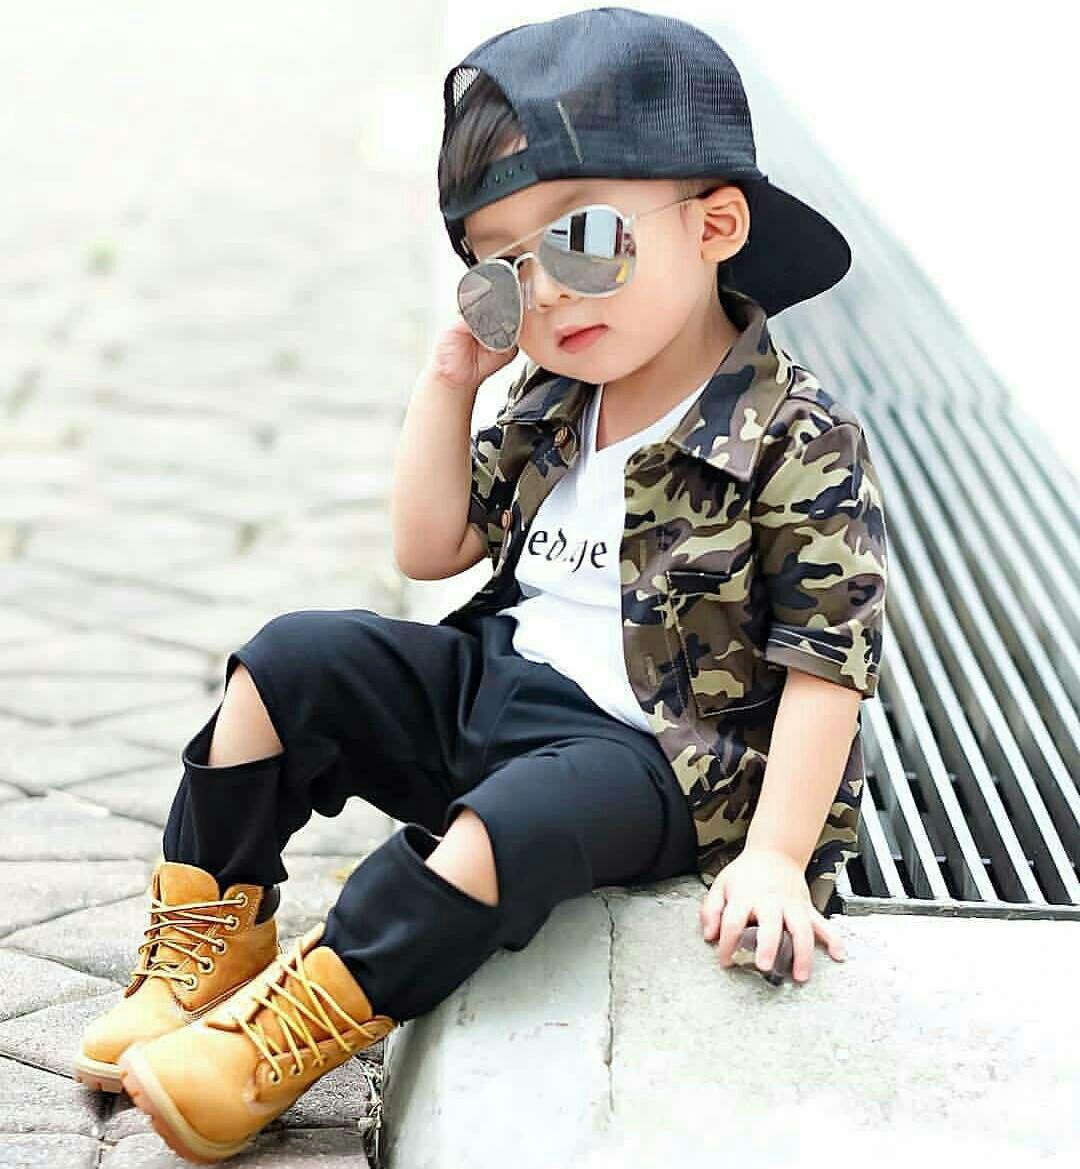 b3dce227a Baby boy fashion | Baby boy fashion | Moda de bebés, Estilo de bebé ...